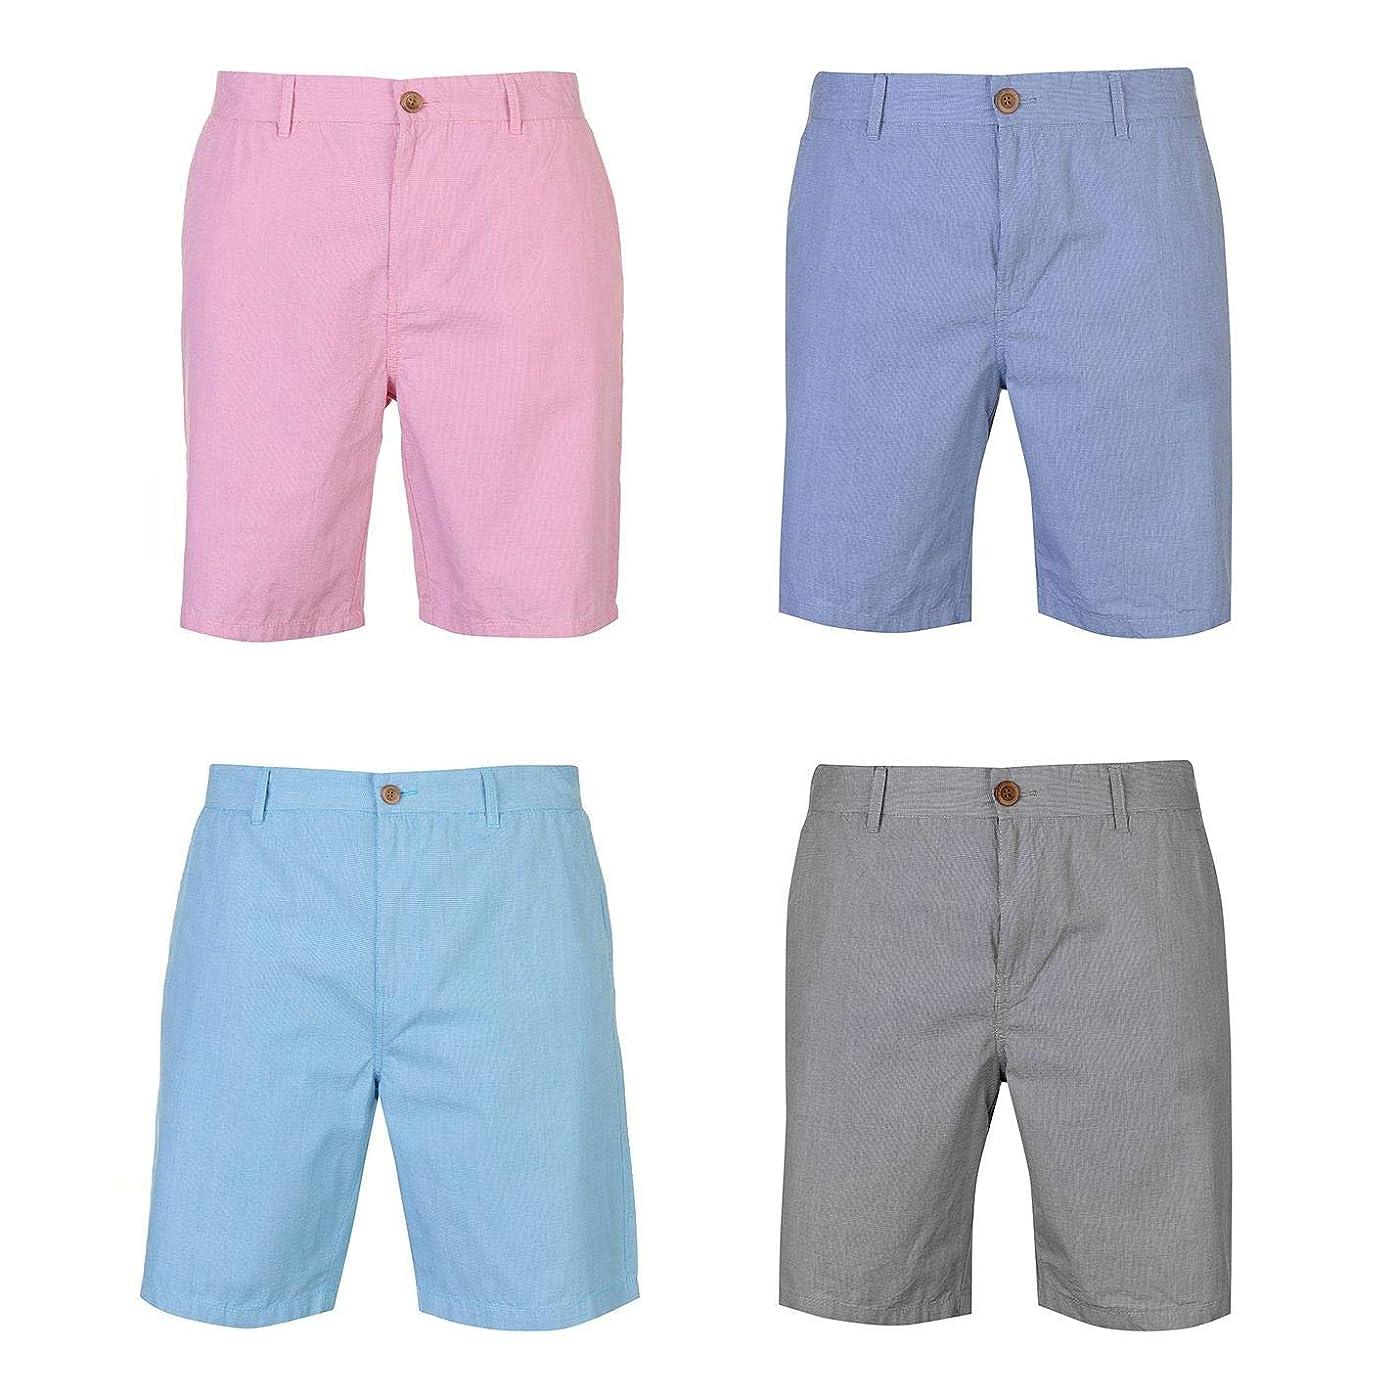 Pierre Cardin Mini Check Shorts Mens Bottoms Short Pants Summerwear